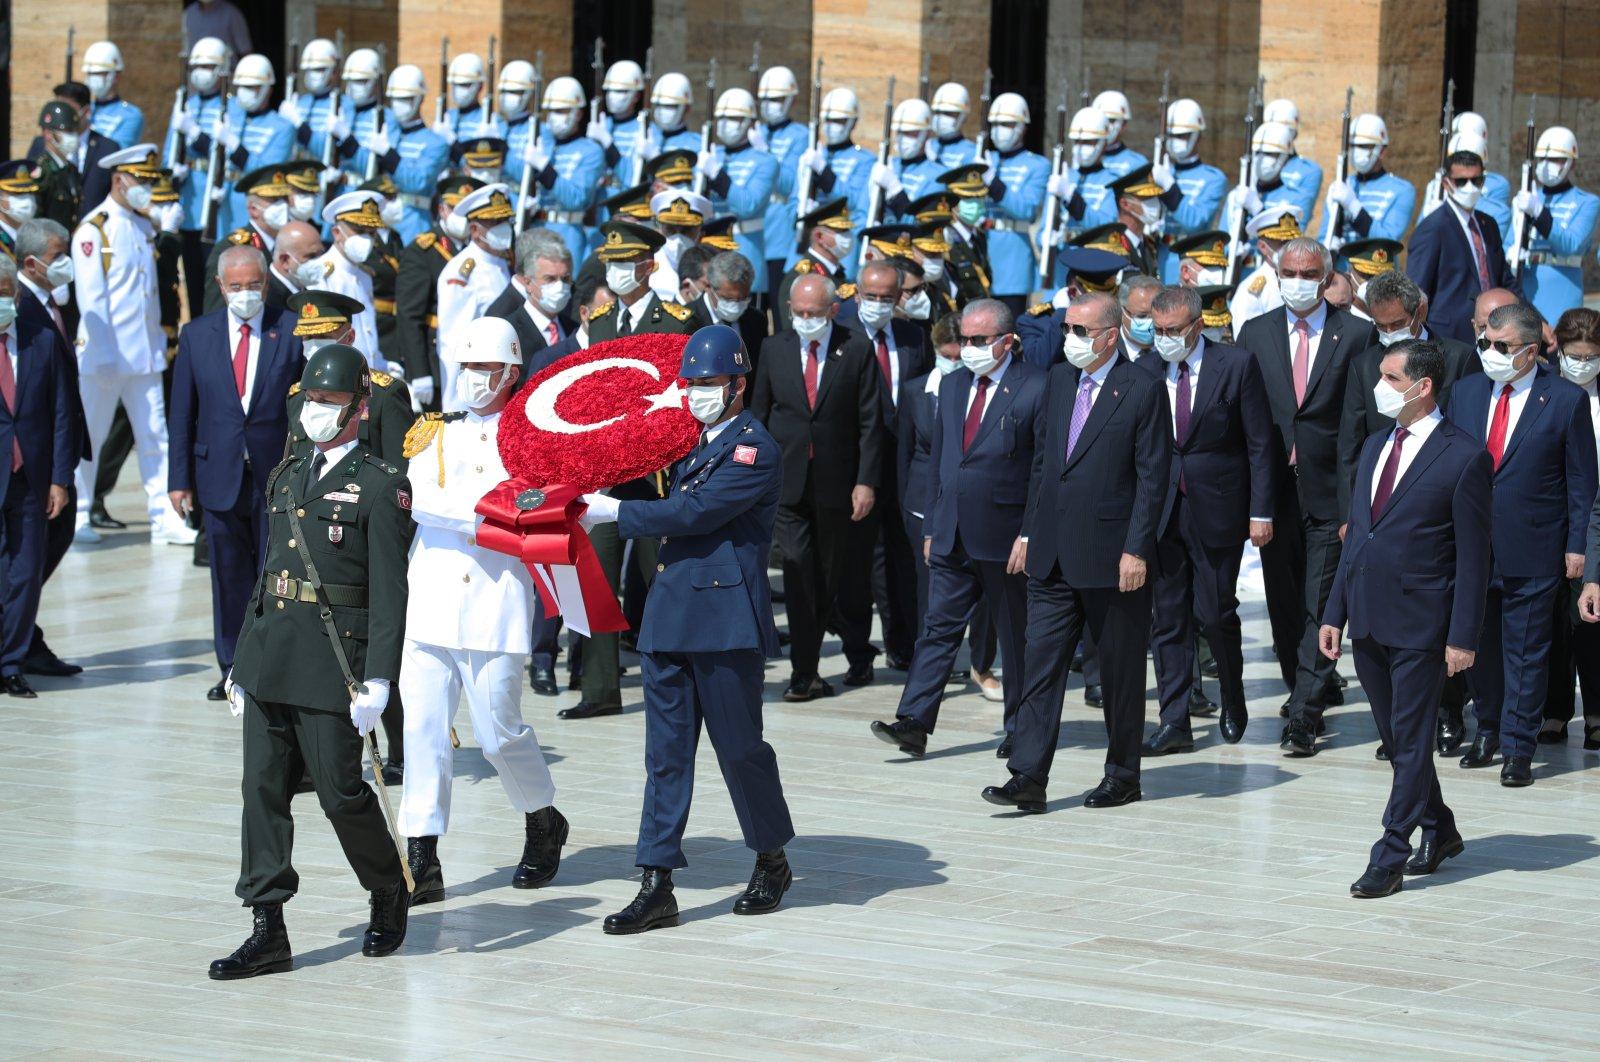 President Recep Tayyip Erdoğan attends Victory Day ceremonies at Ataturk's Mausoleum, in Ankara, Turkey, Aug. 30, 2021. (AA Photo)